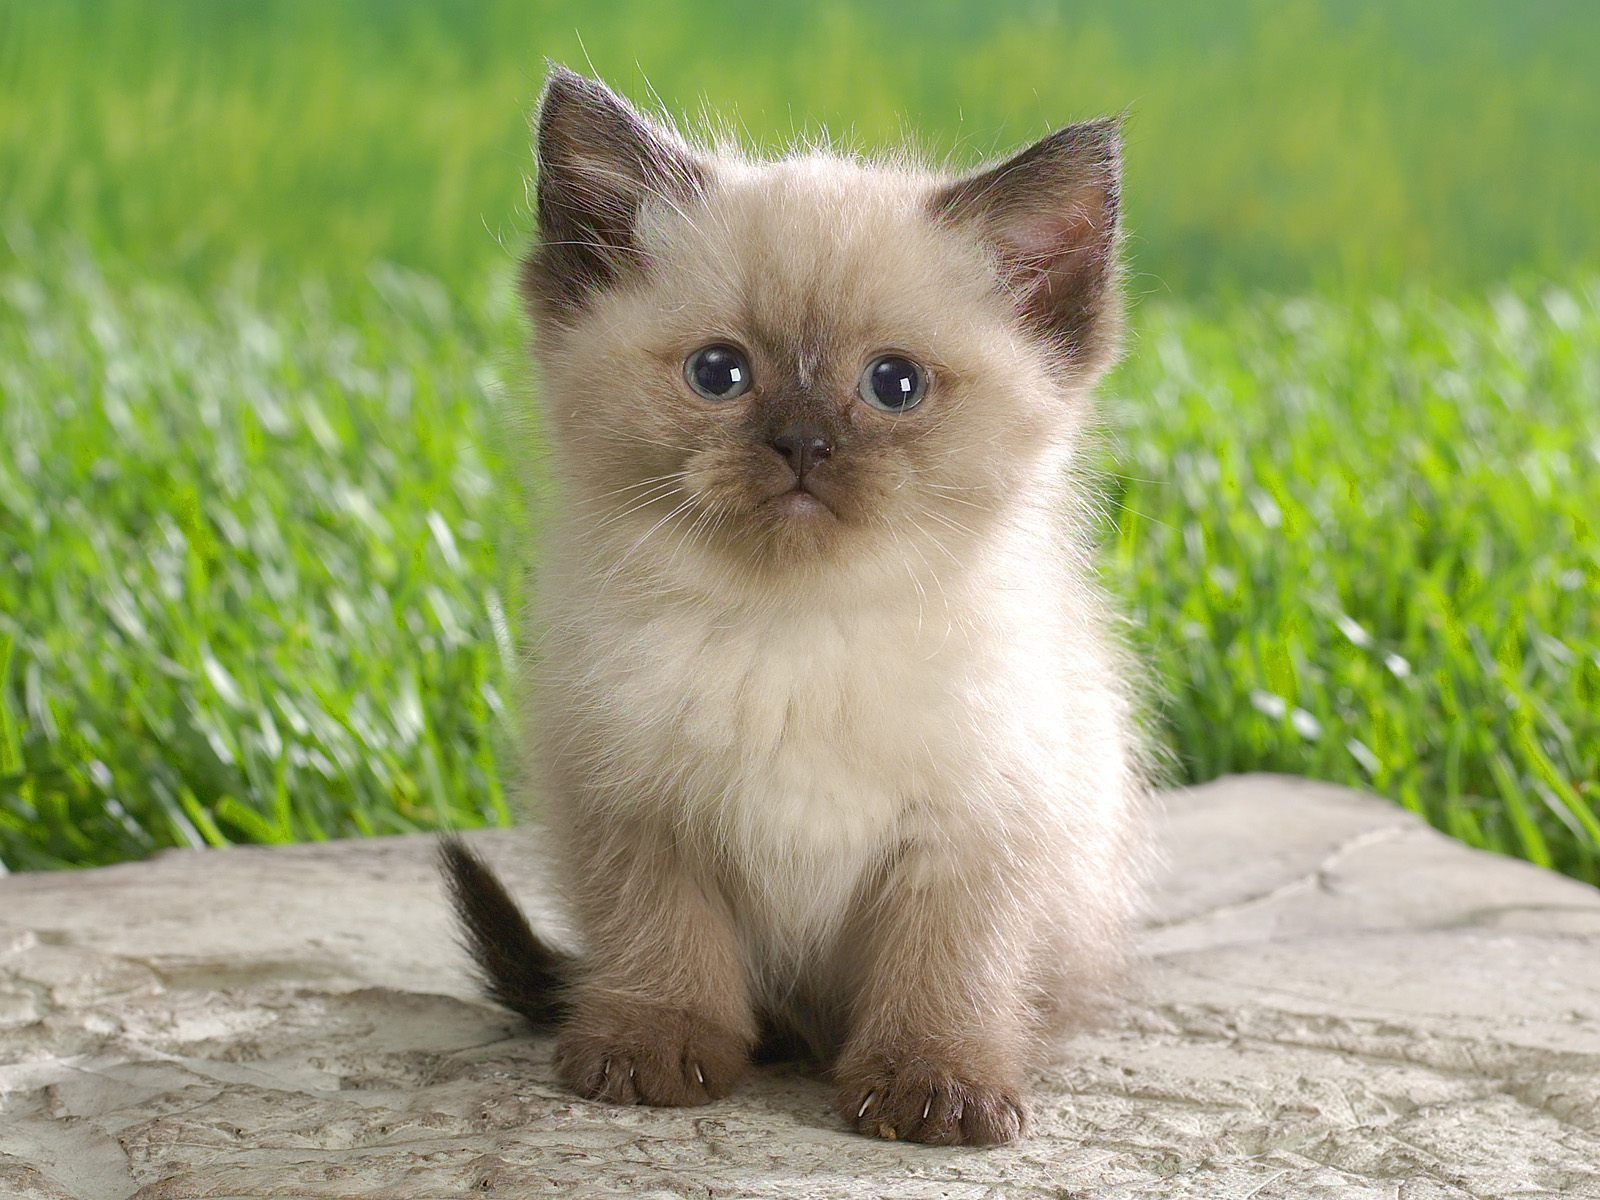 Animals Himalayan Kitten desktop wallpaper nr 39909 1600x1200